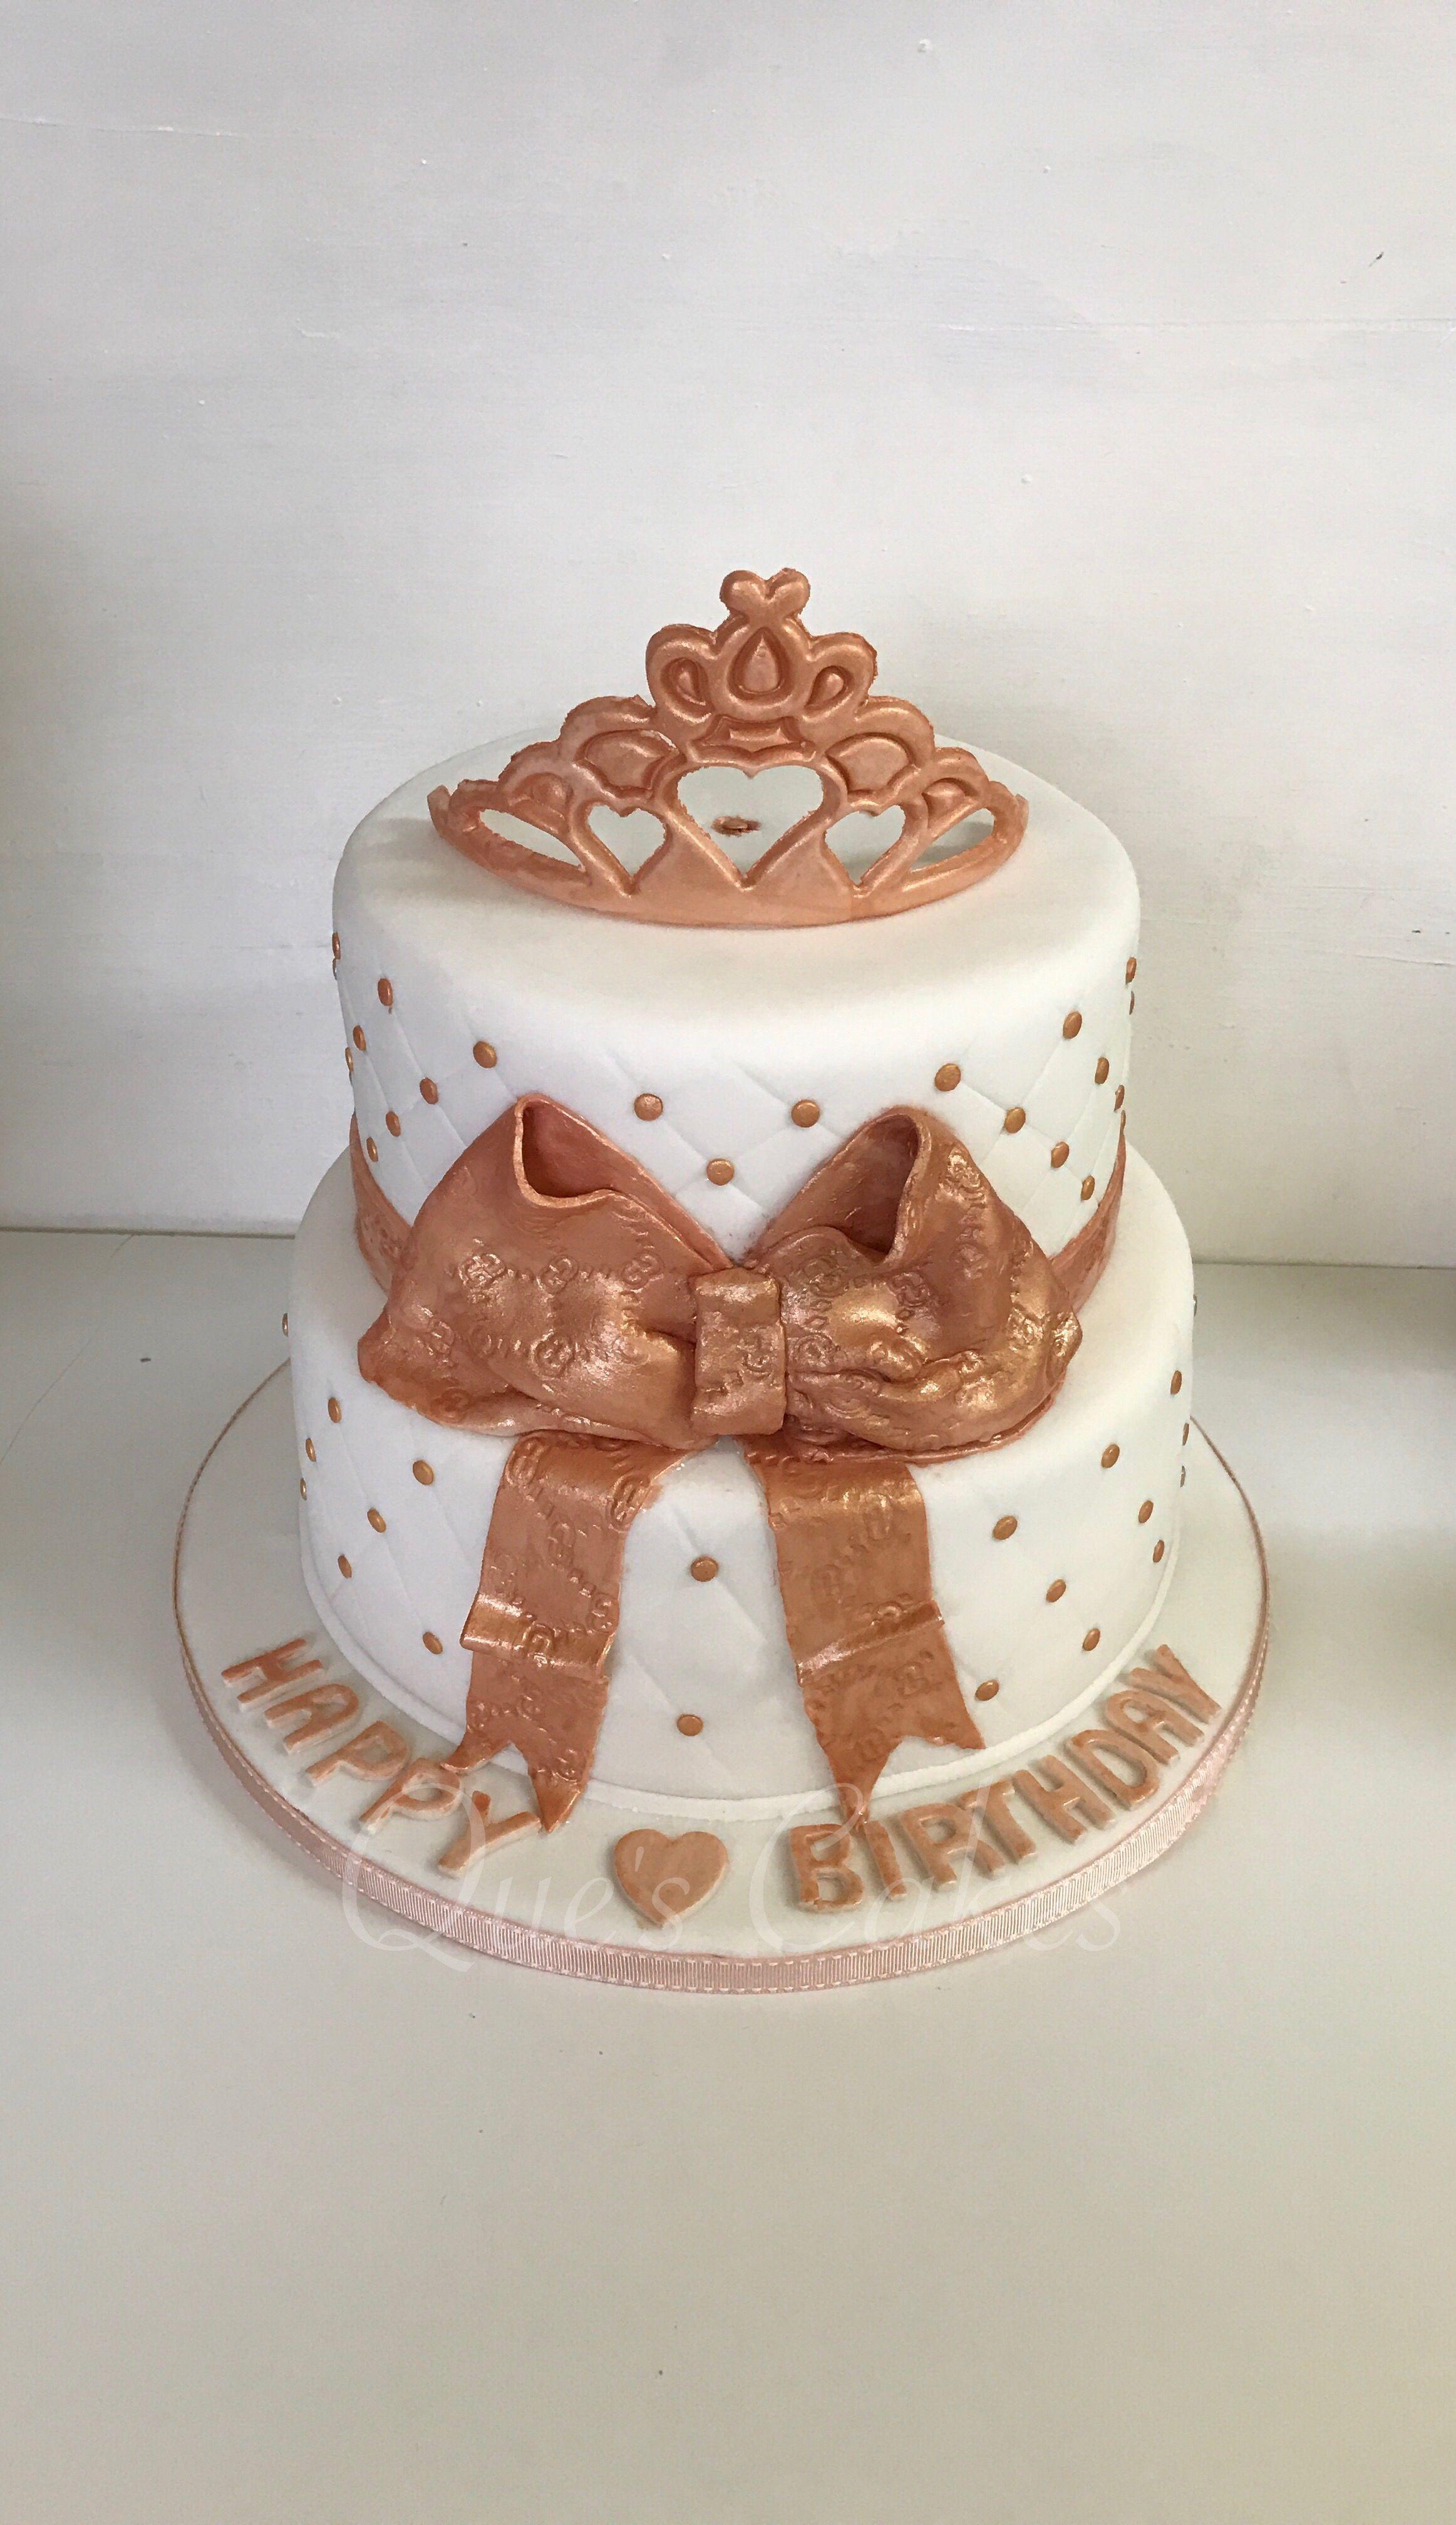 rose gold cake birthday cake cakes pinterest gold. Black Bedroom Furniture Sets. Home Design Ideas